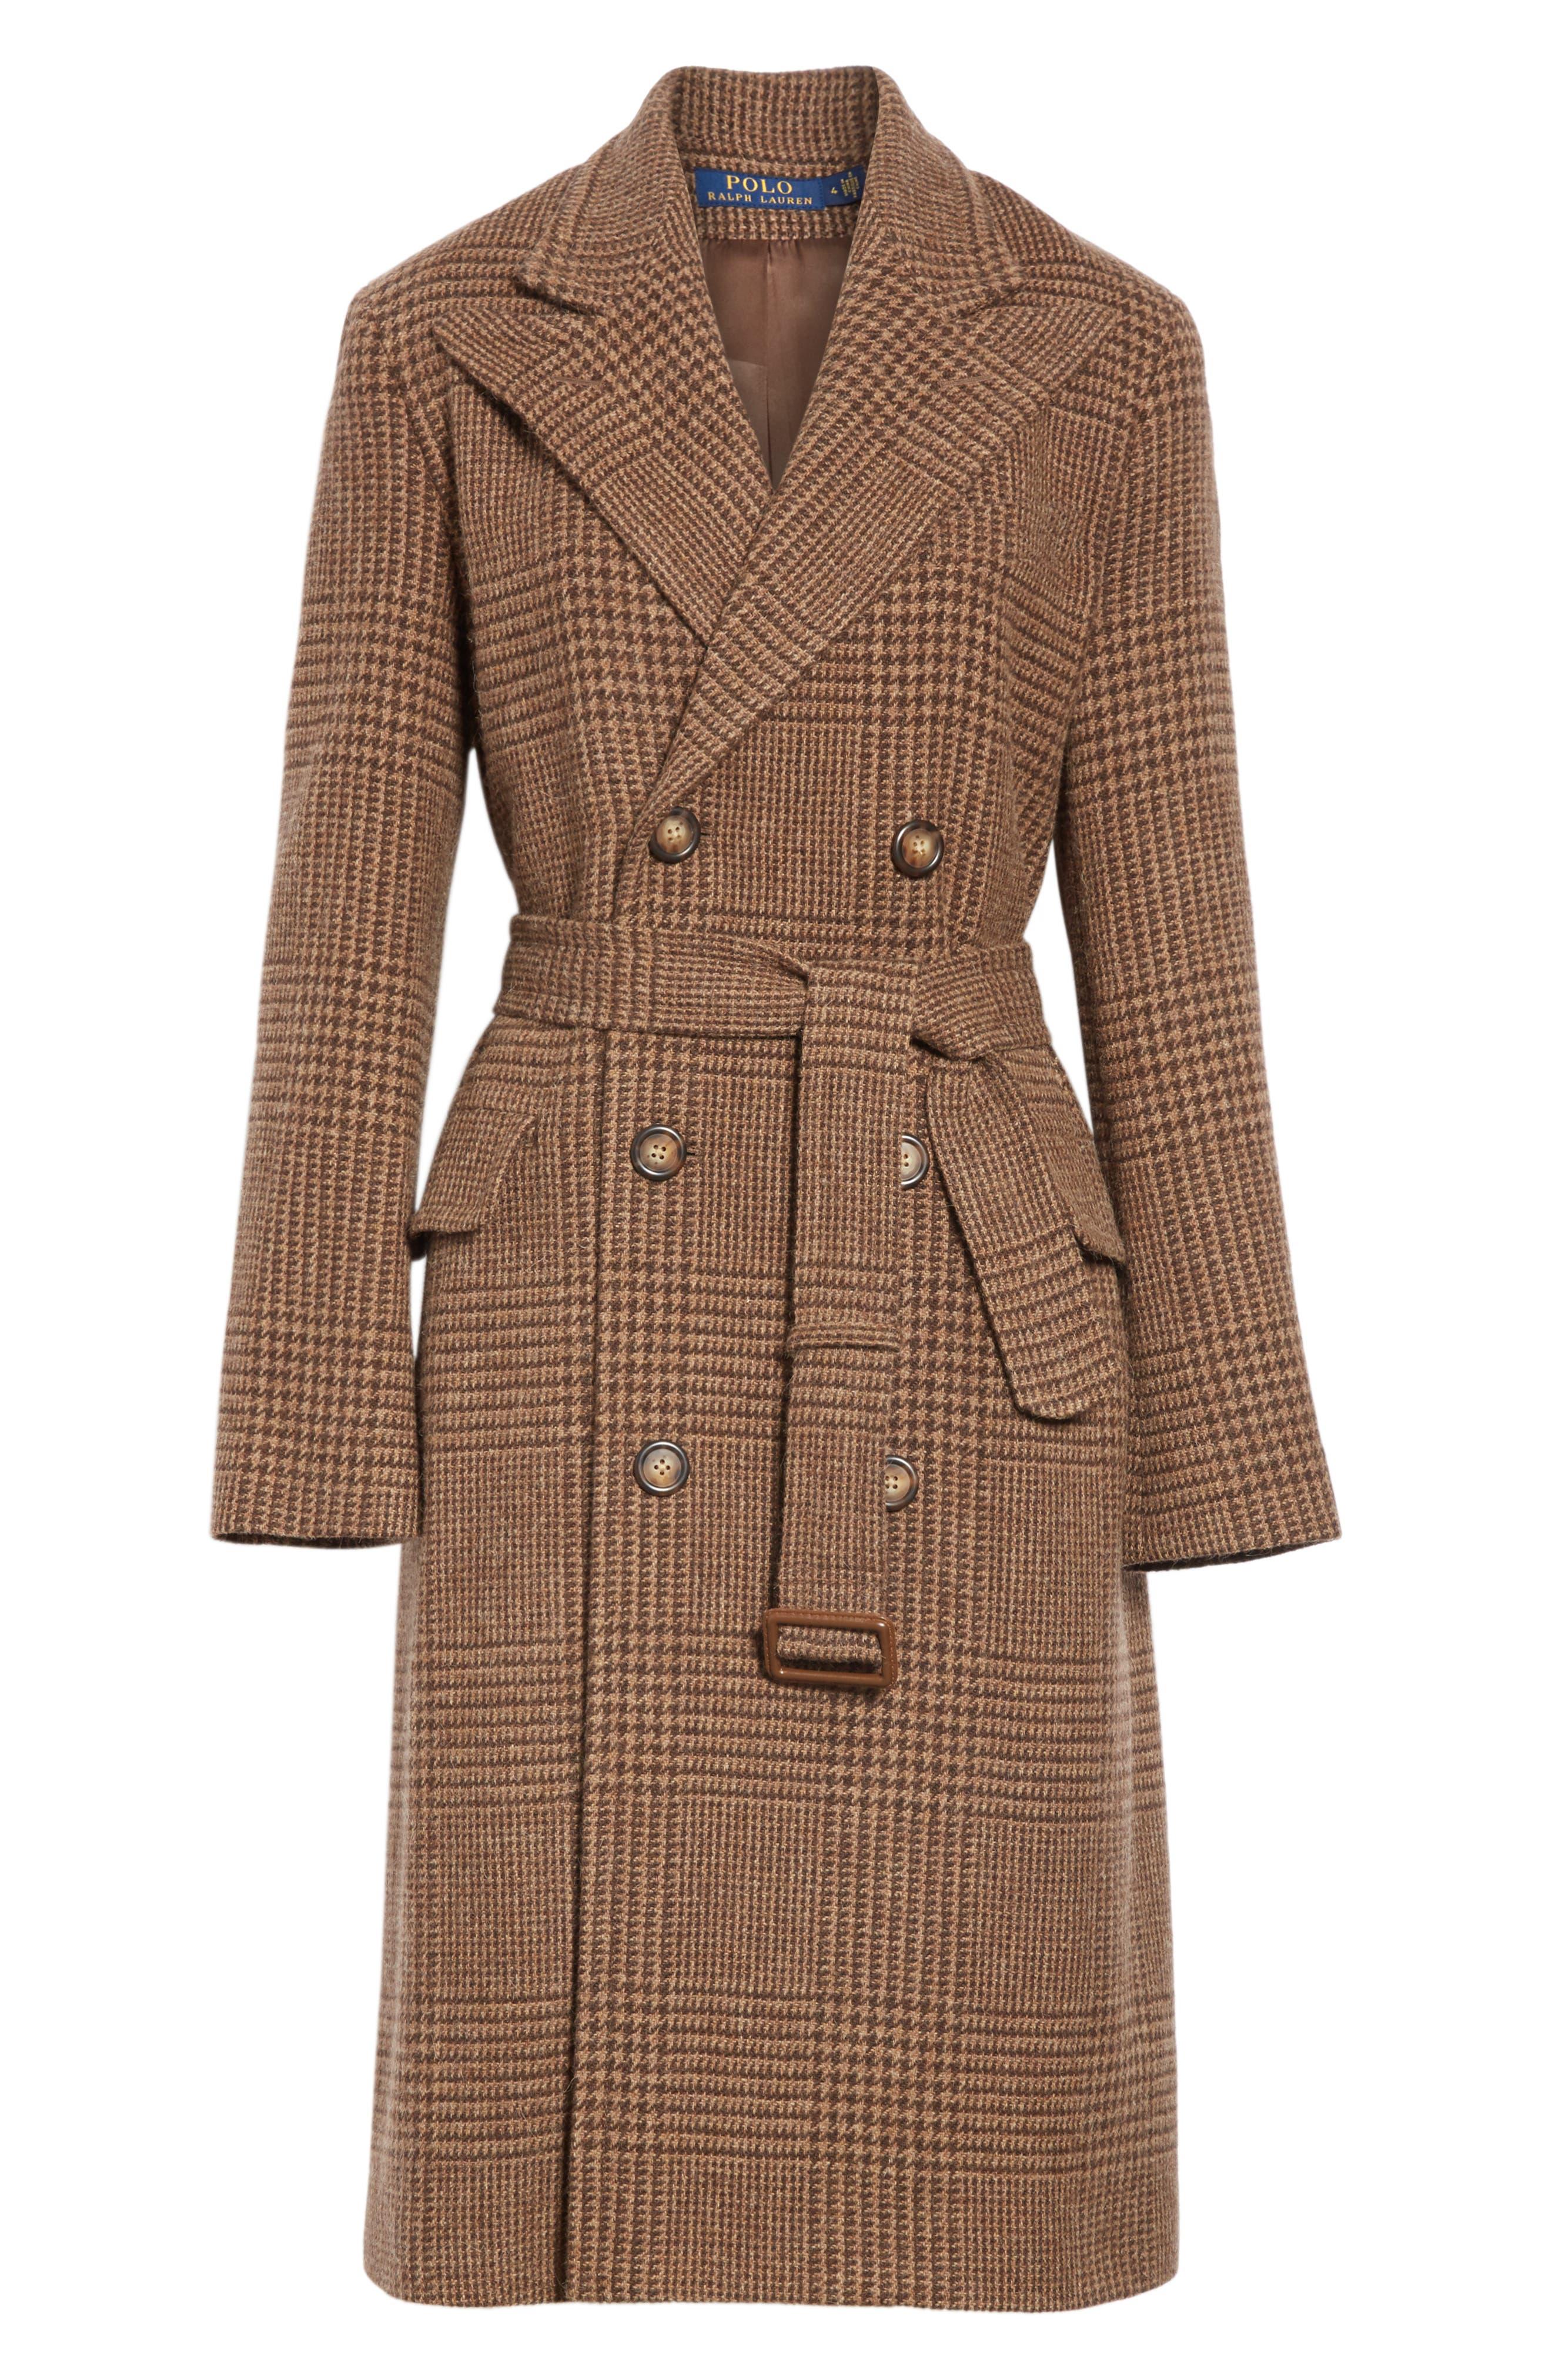 Plaid Lambswool & Alpaca Belted Coat,                             Alternate thumbnail 5, color,                             BROWN GLEN PLAID